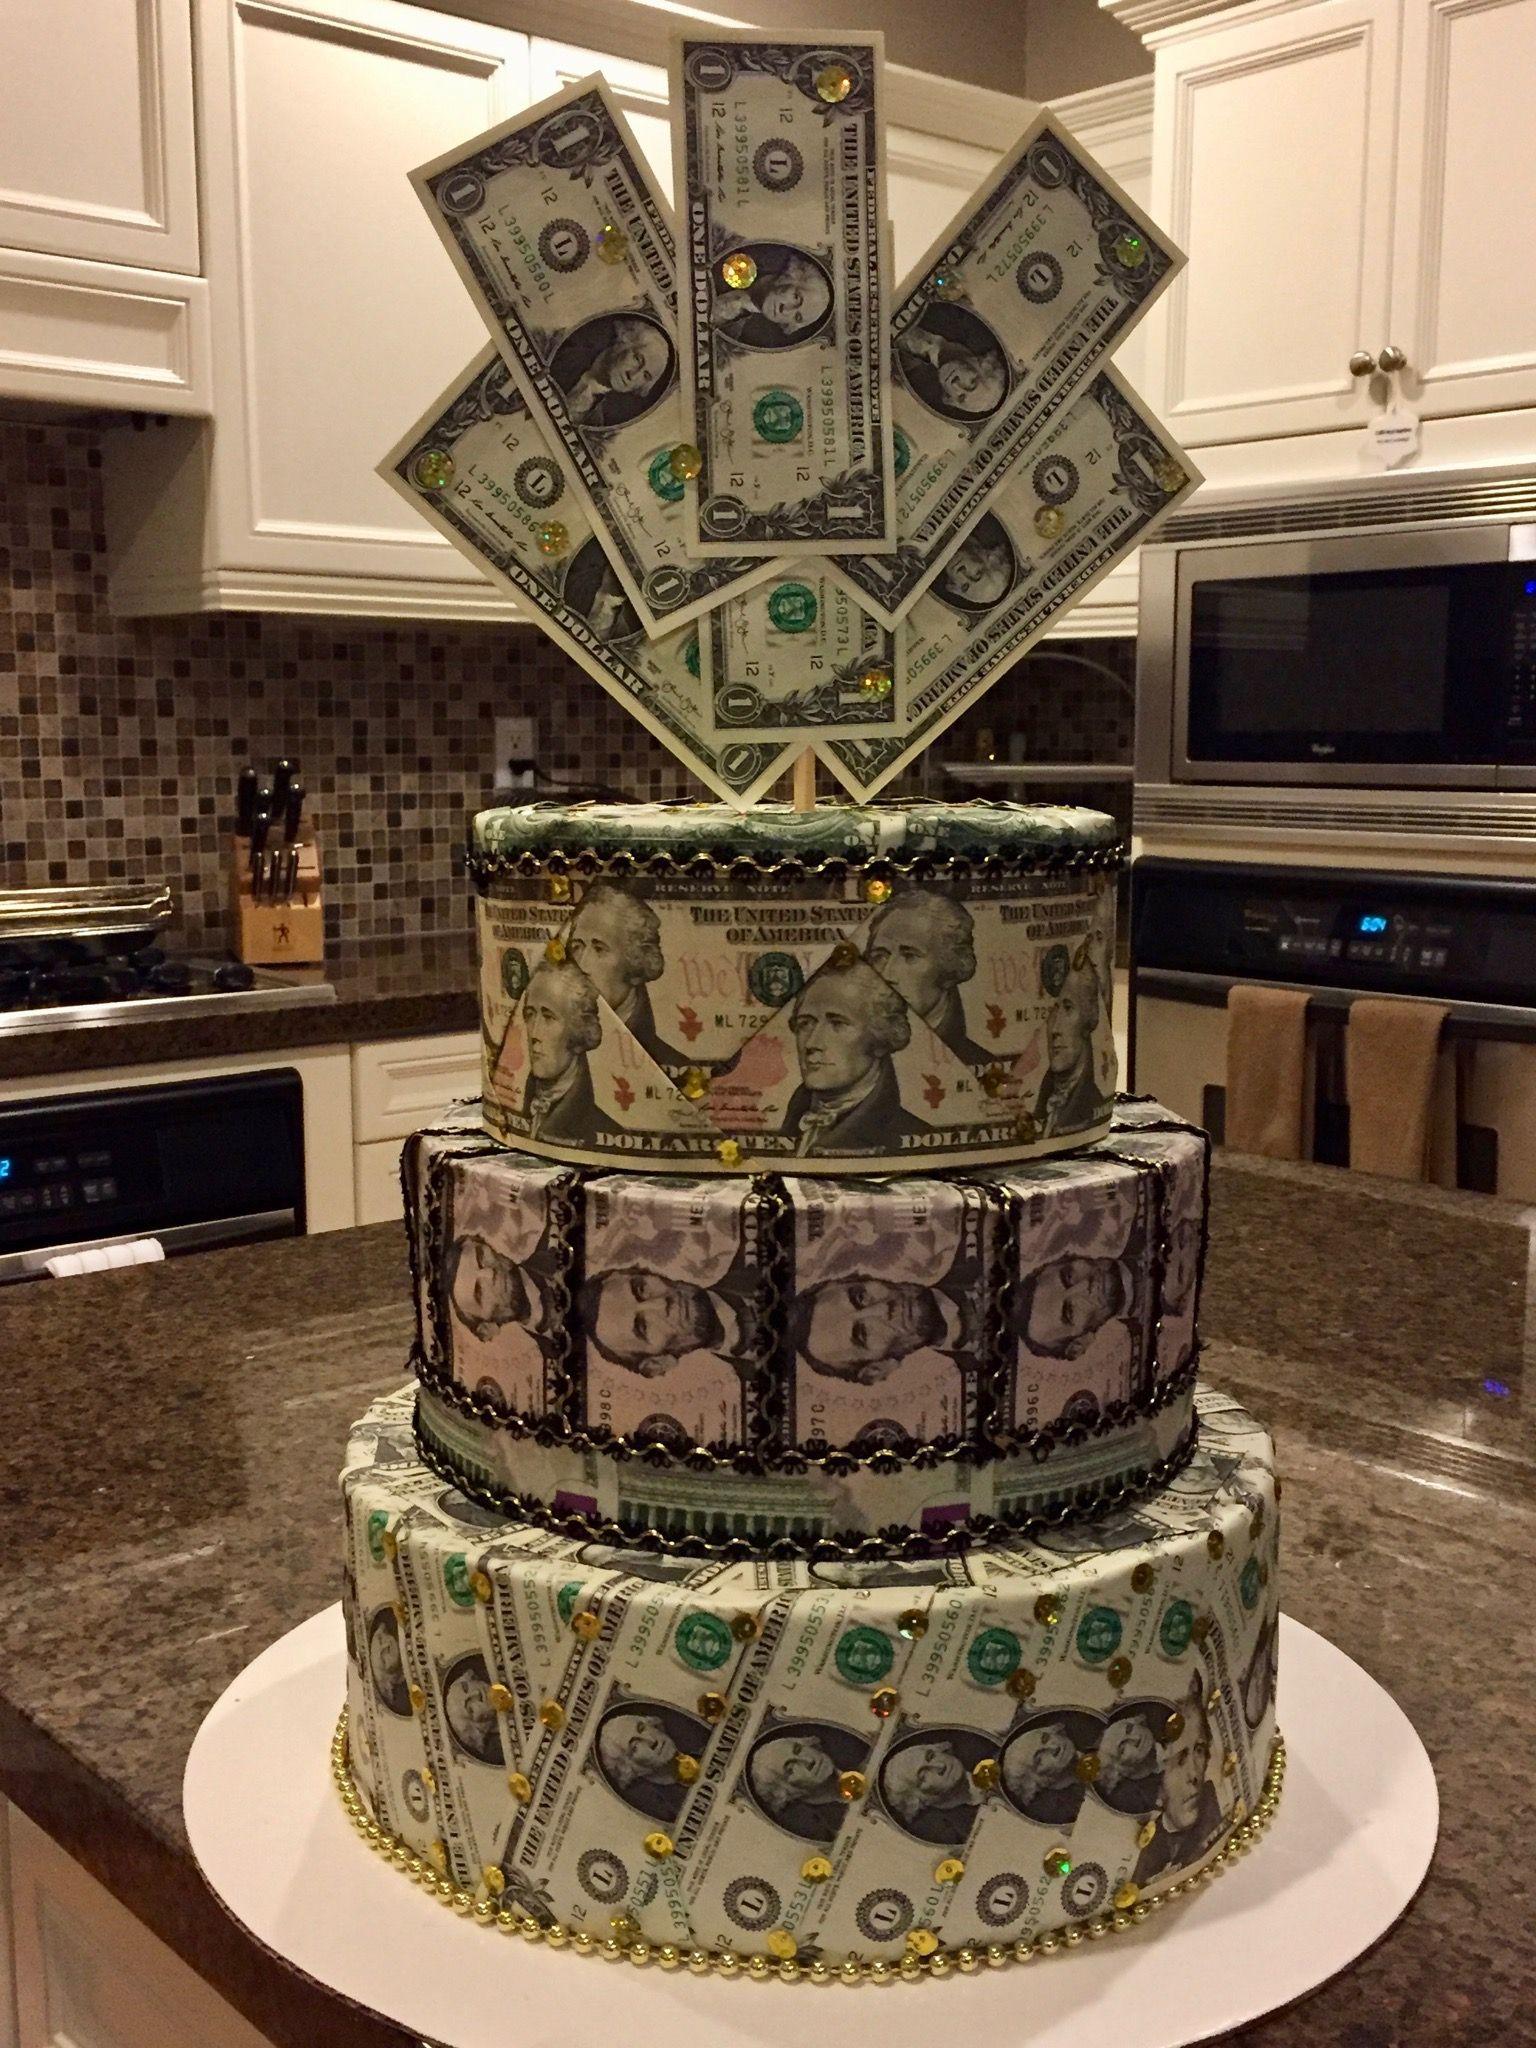 Stupendous Making A Money Birthday Cake Easy Craft Ideas Personalised Birthday Cards Veneteletsinfo